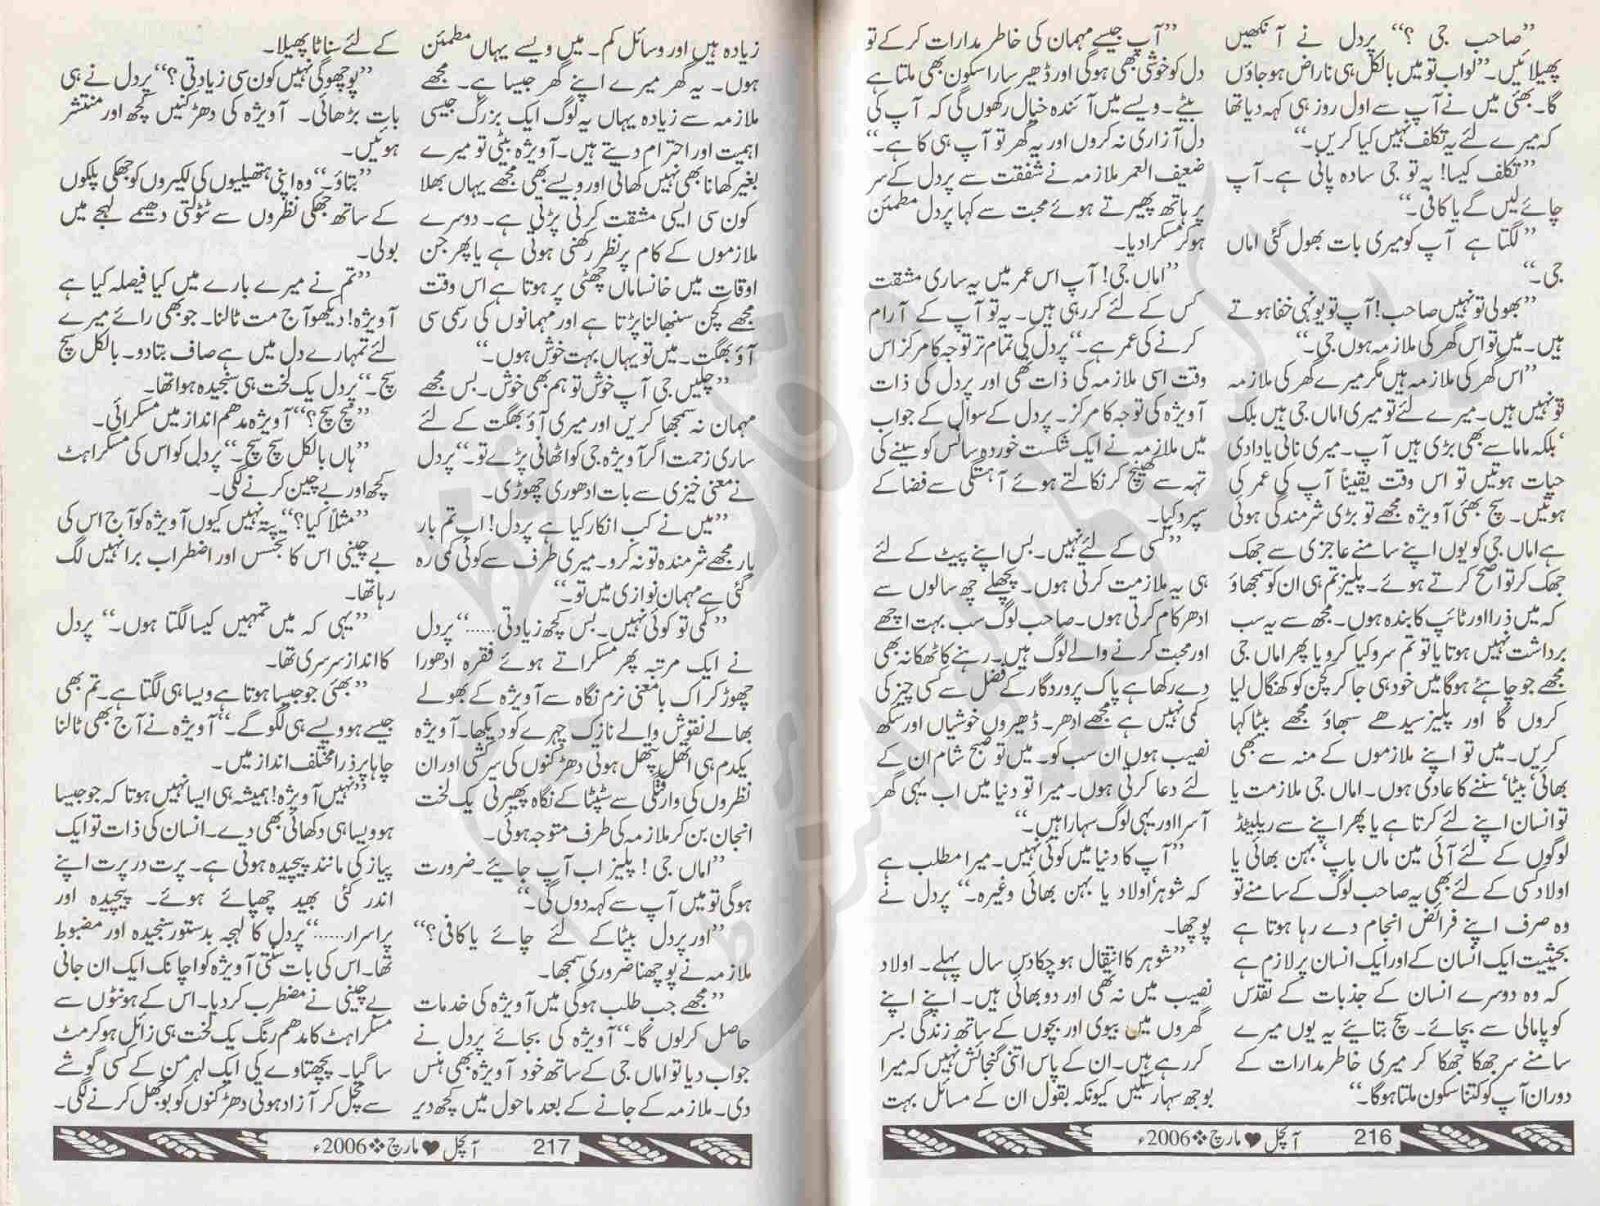 Kutab library koi dil ke khail deakhay by syeda gul bano for Syeda gul bano novels